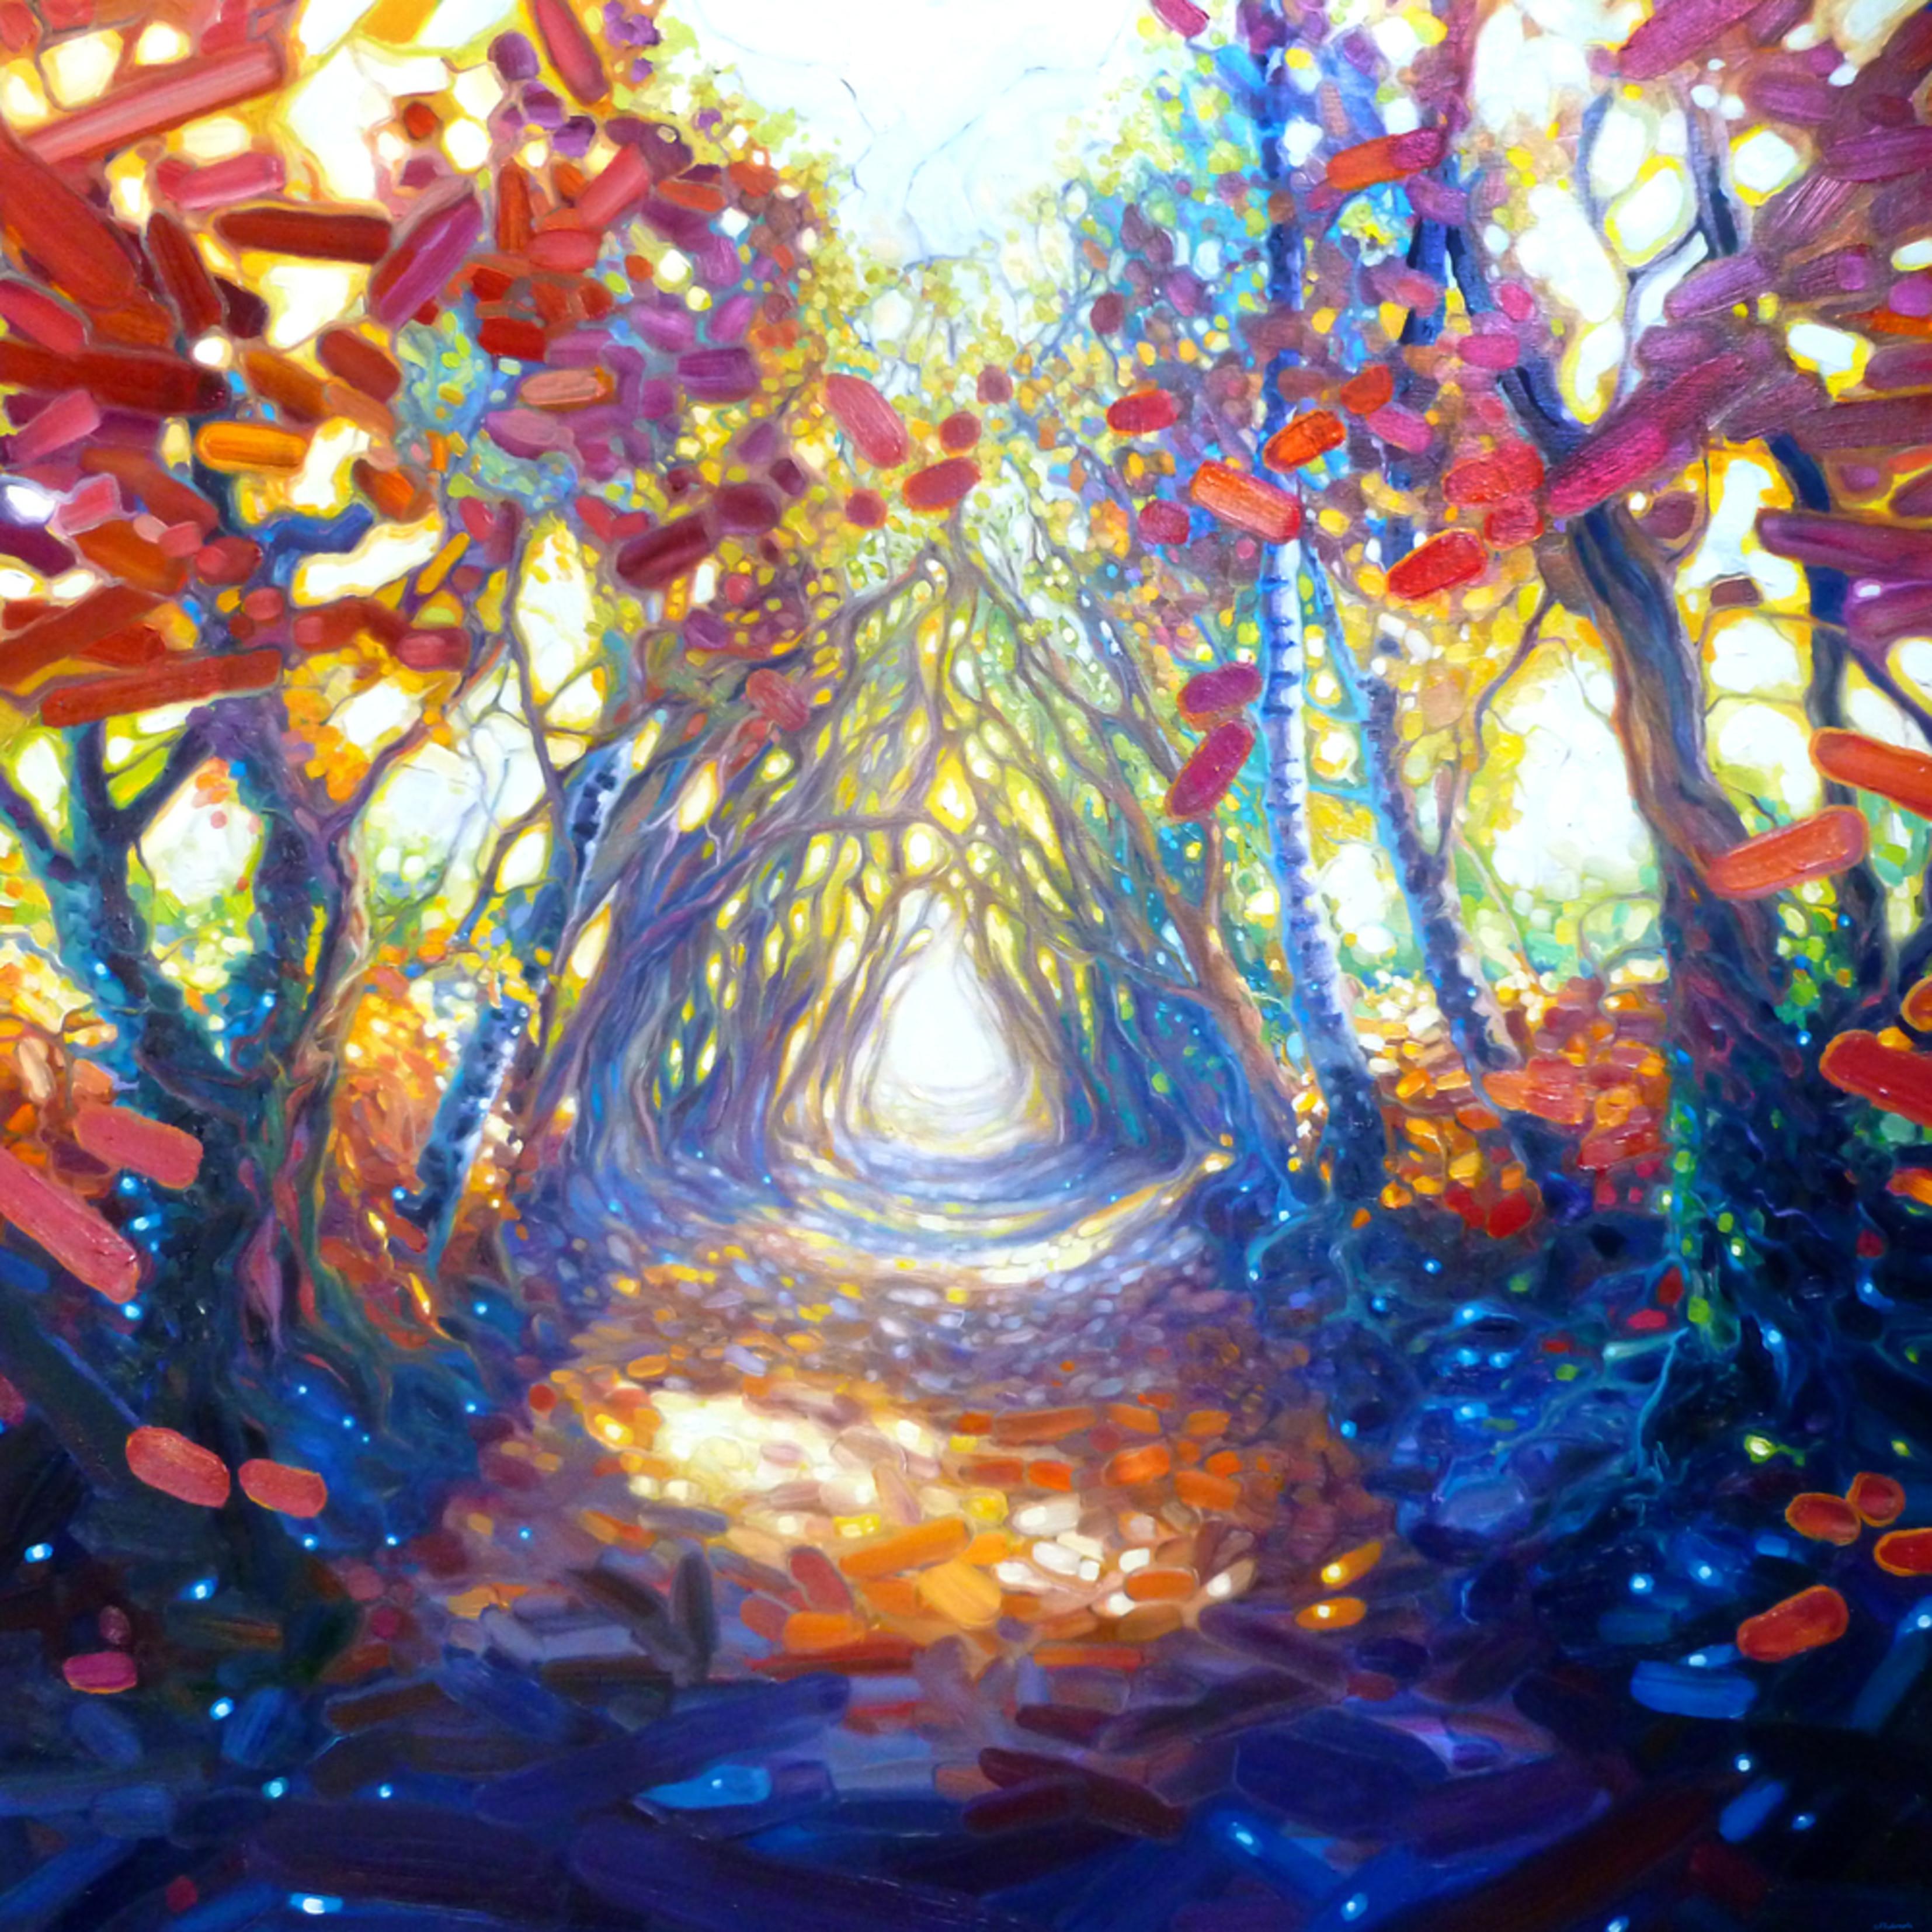 Woodland path to somewhere wonderful vuajeu